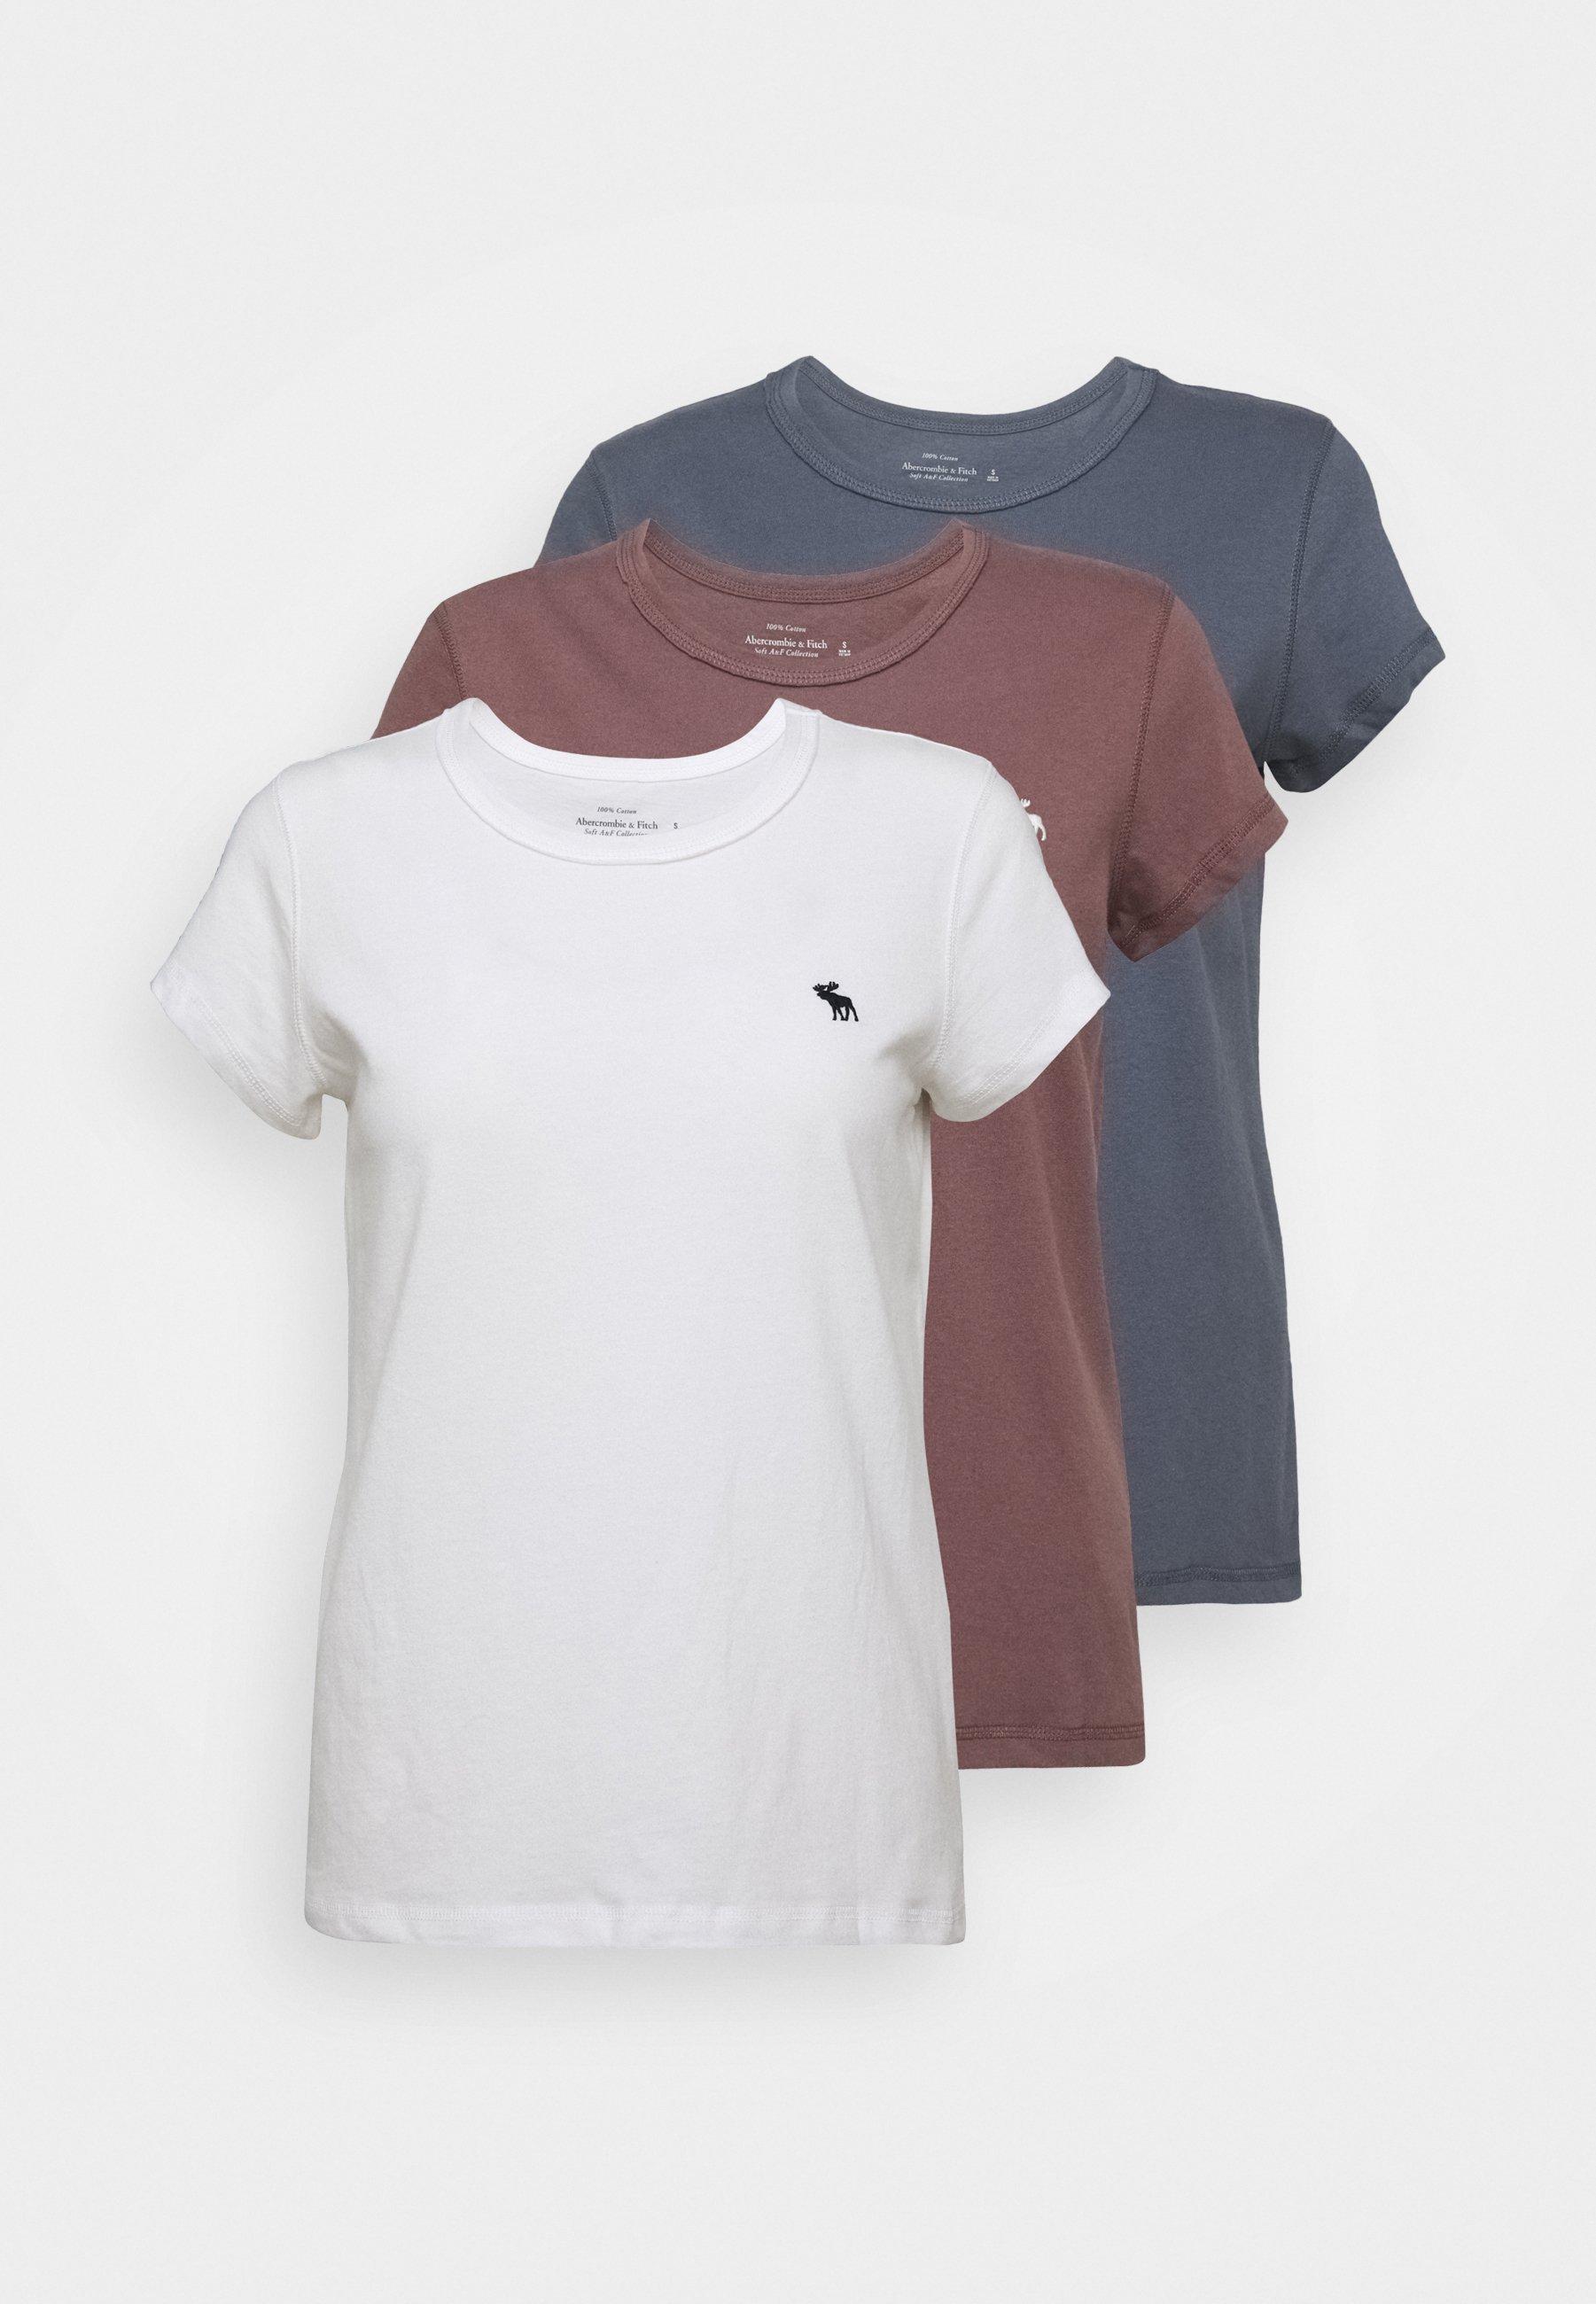 Abercrombie & Fitch SEASONAL 3 PACK - T-shirt basic - navy/white/red - Abbigliamento da donna Sbrigati